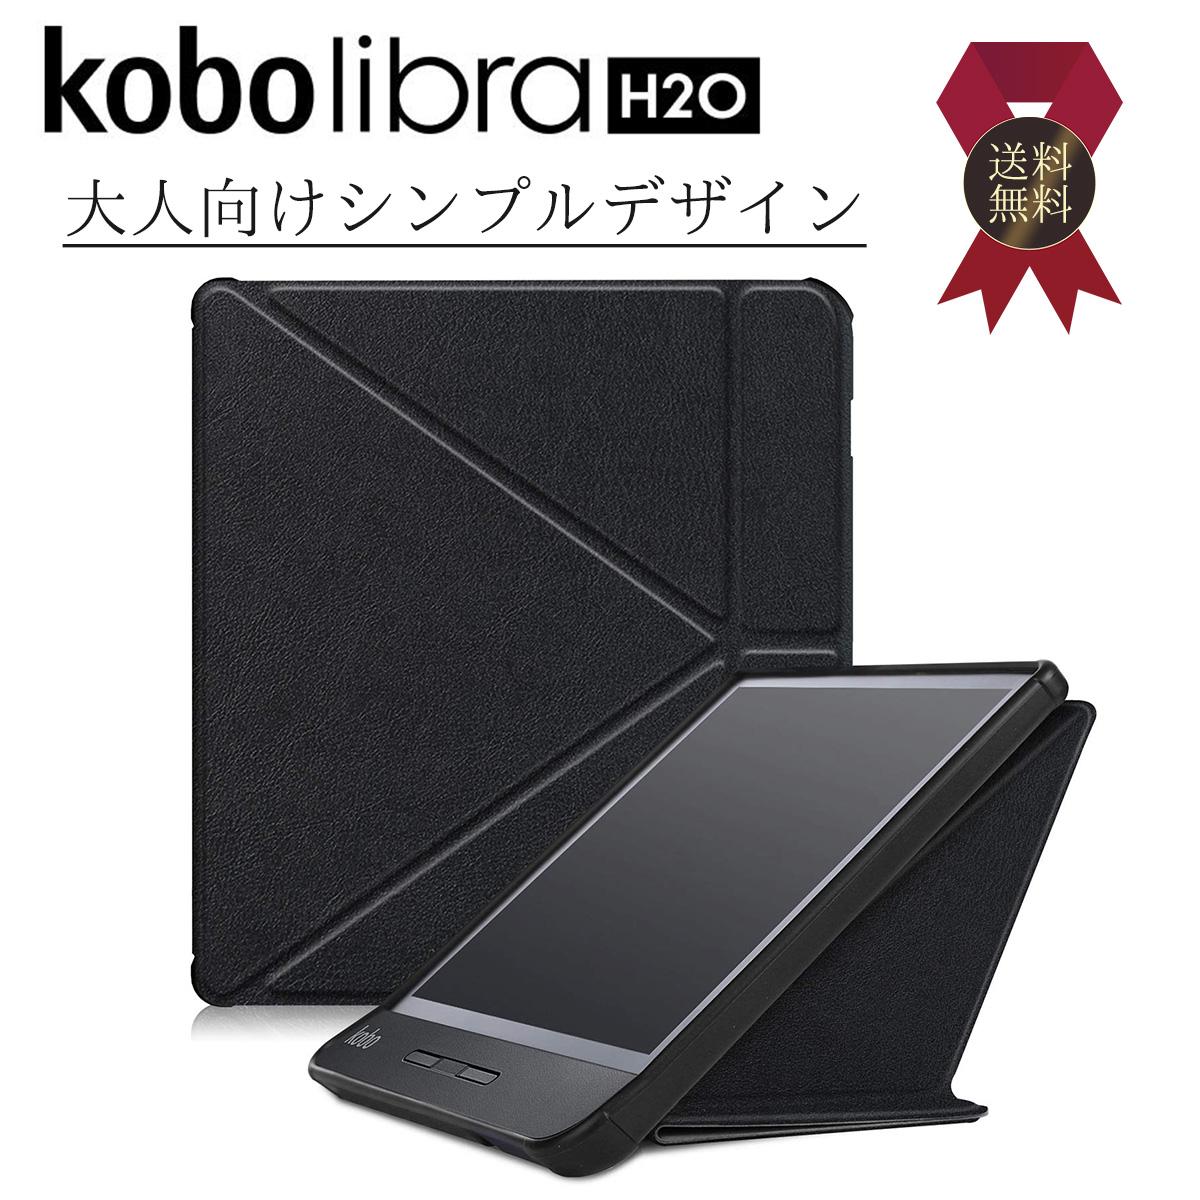 Kobo カバー ケース Libra H2O 電子書籍 リーダー オートスリープ スマート タブレットケース タブレットカバー 軽量 送料無料 コボ 薄型 大放出セール フラップ 即納 RAKUTEN オート リブラ スリープ Book ポイント消化